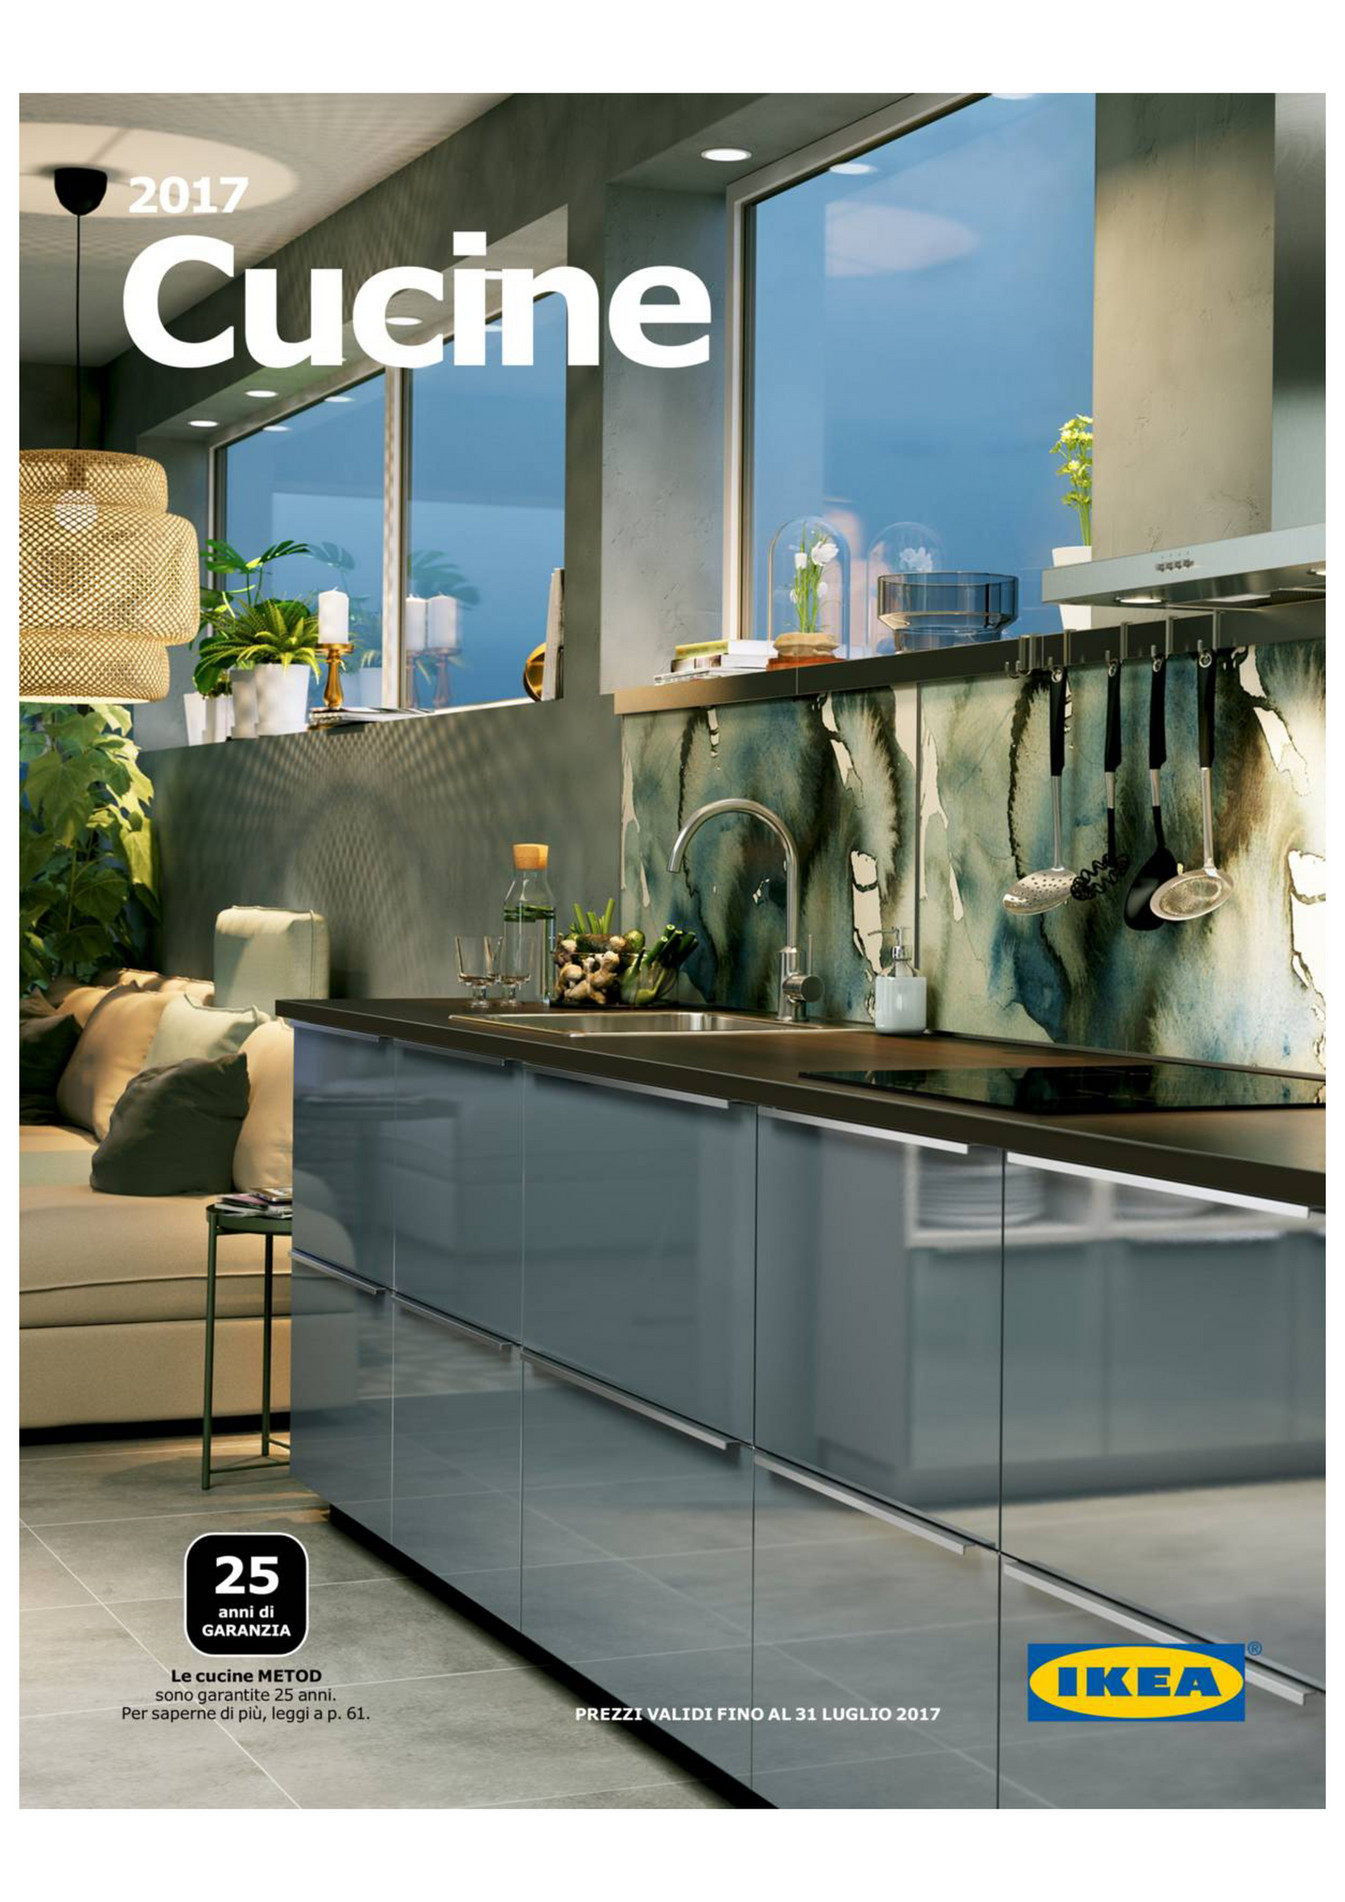 Catalogo cucine ikea 2017 casamia idea di immagine - Cucine ikea catalogo 2017 ...